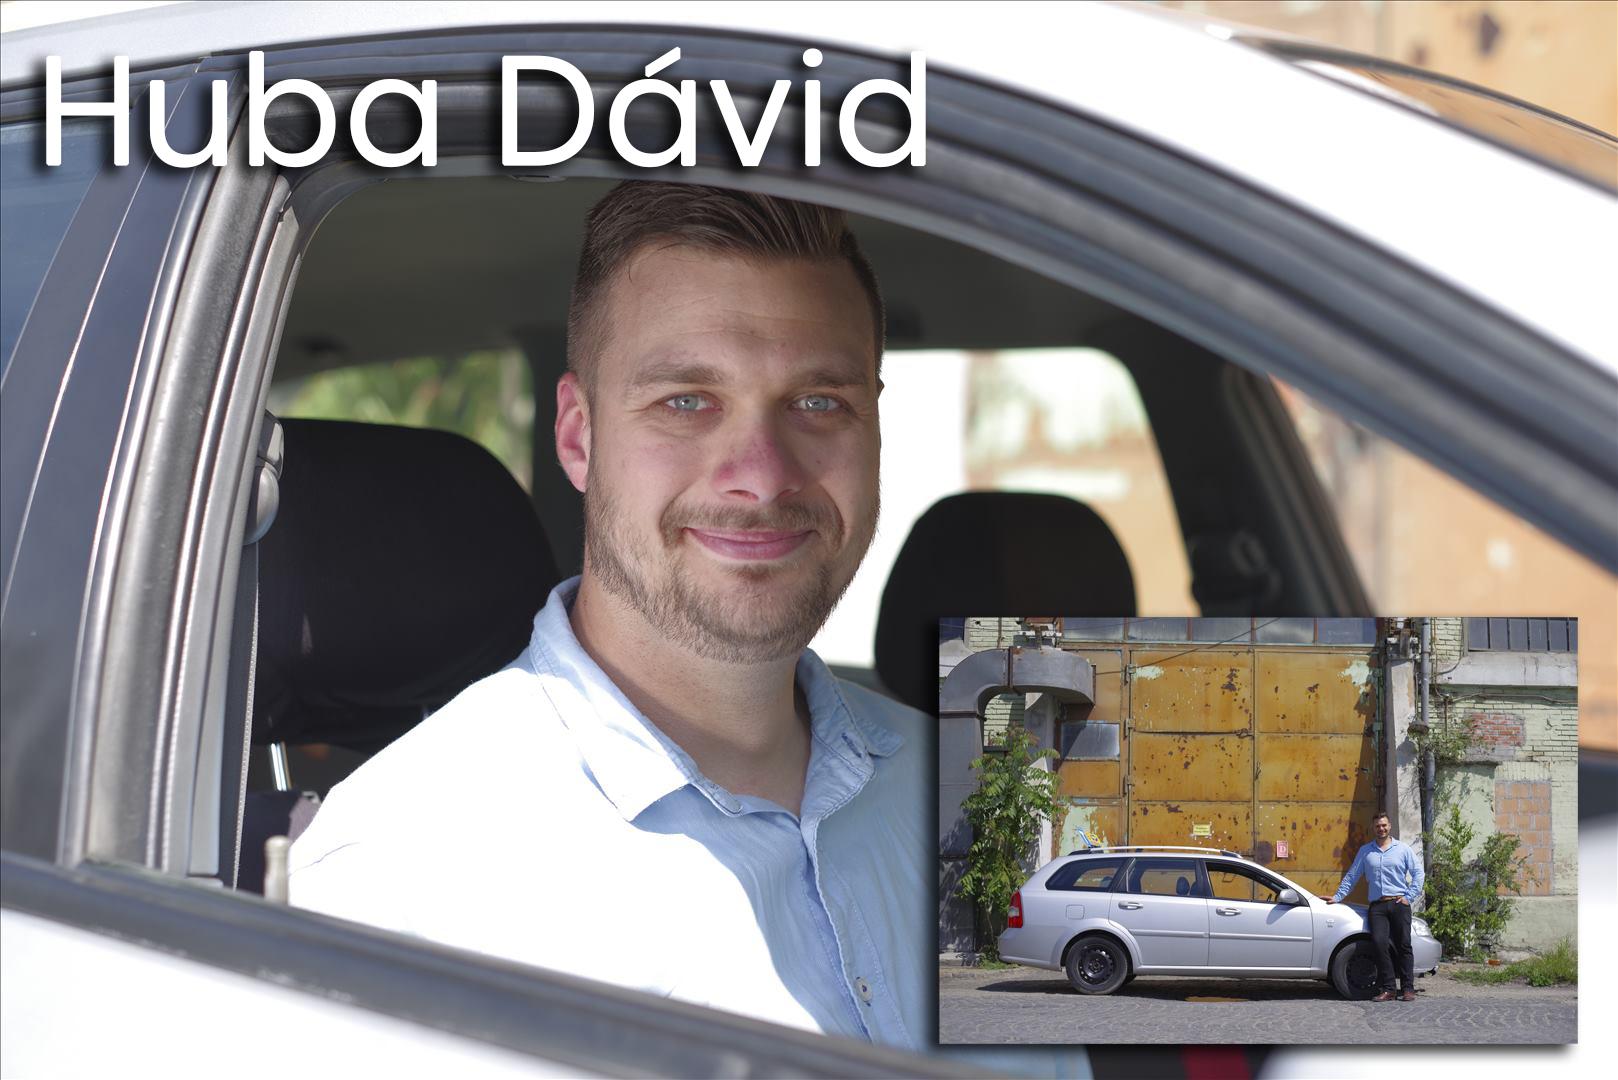 huba_david_autosiskola